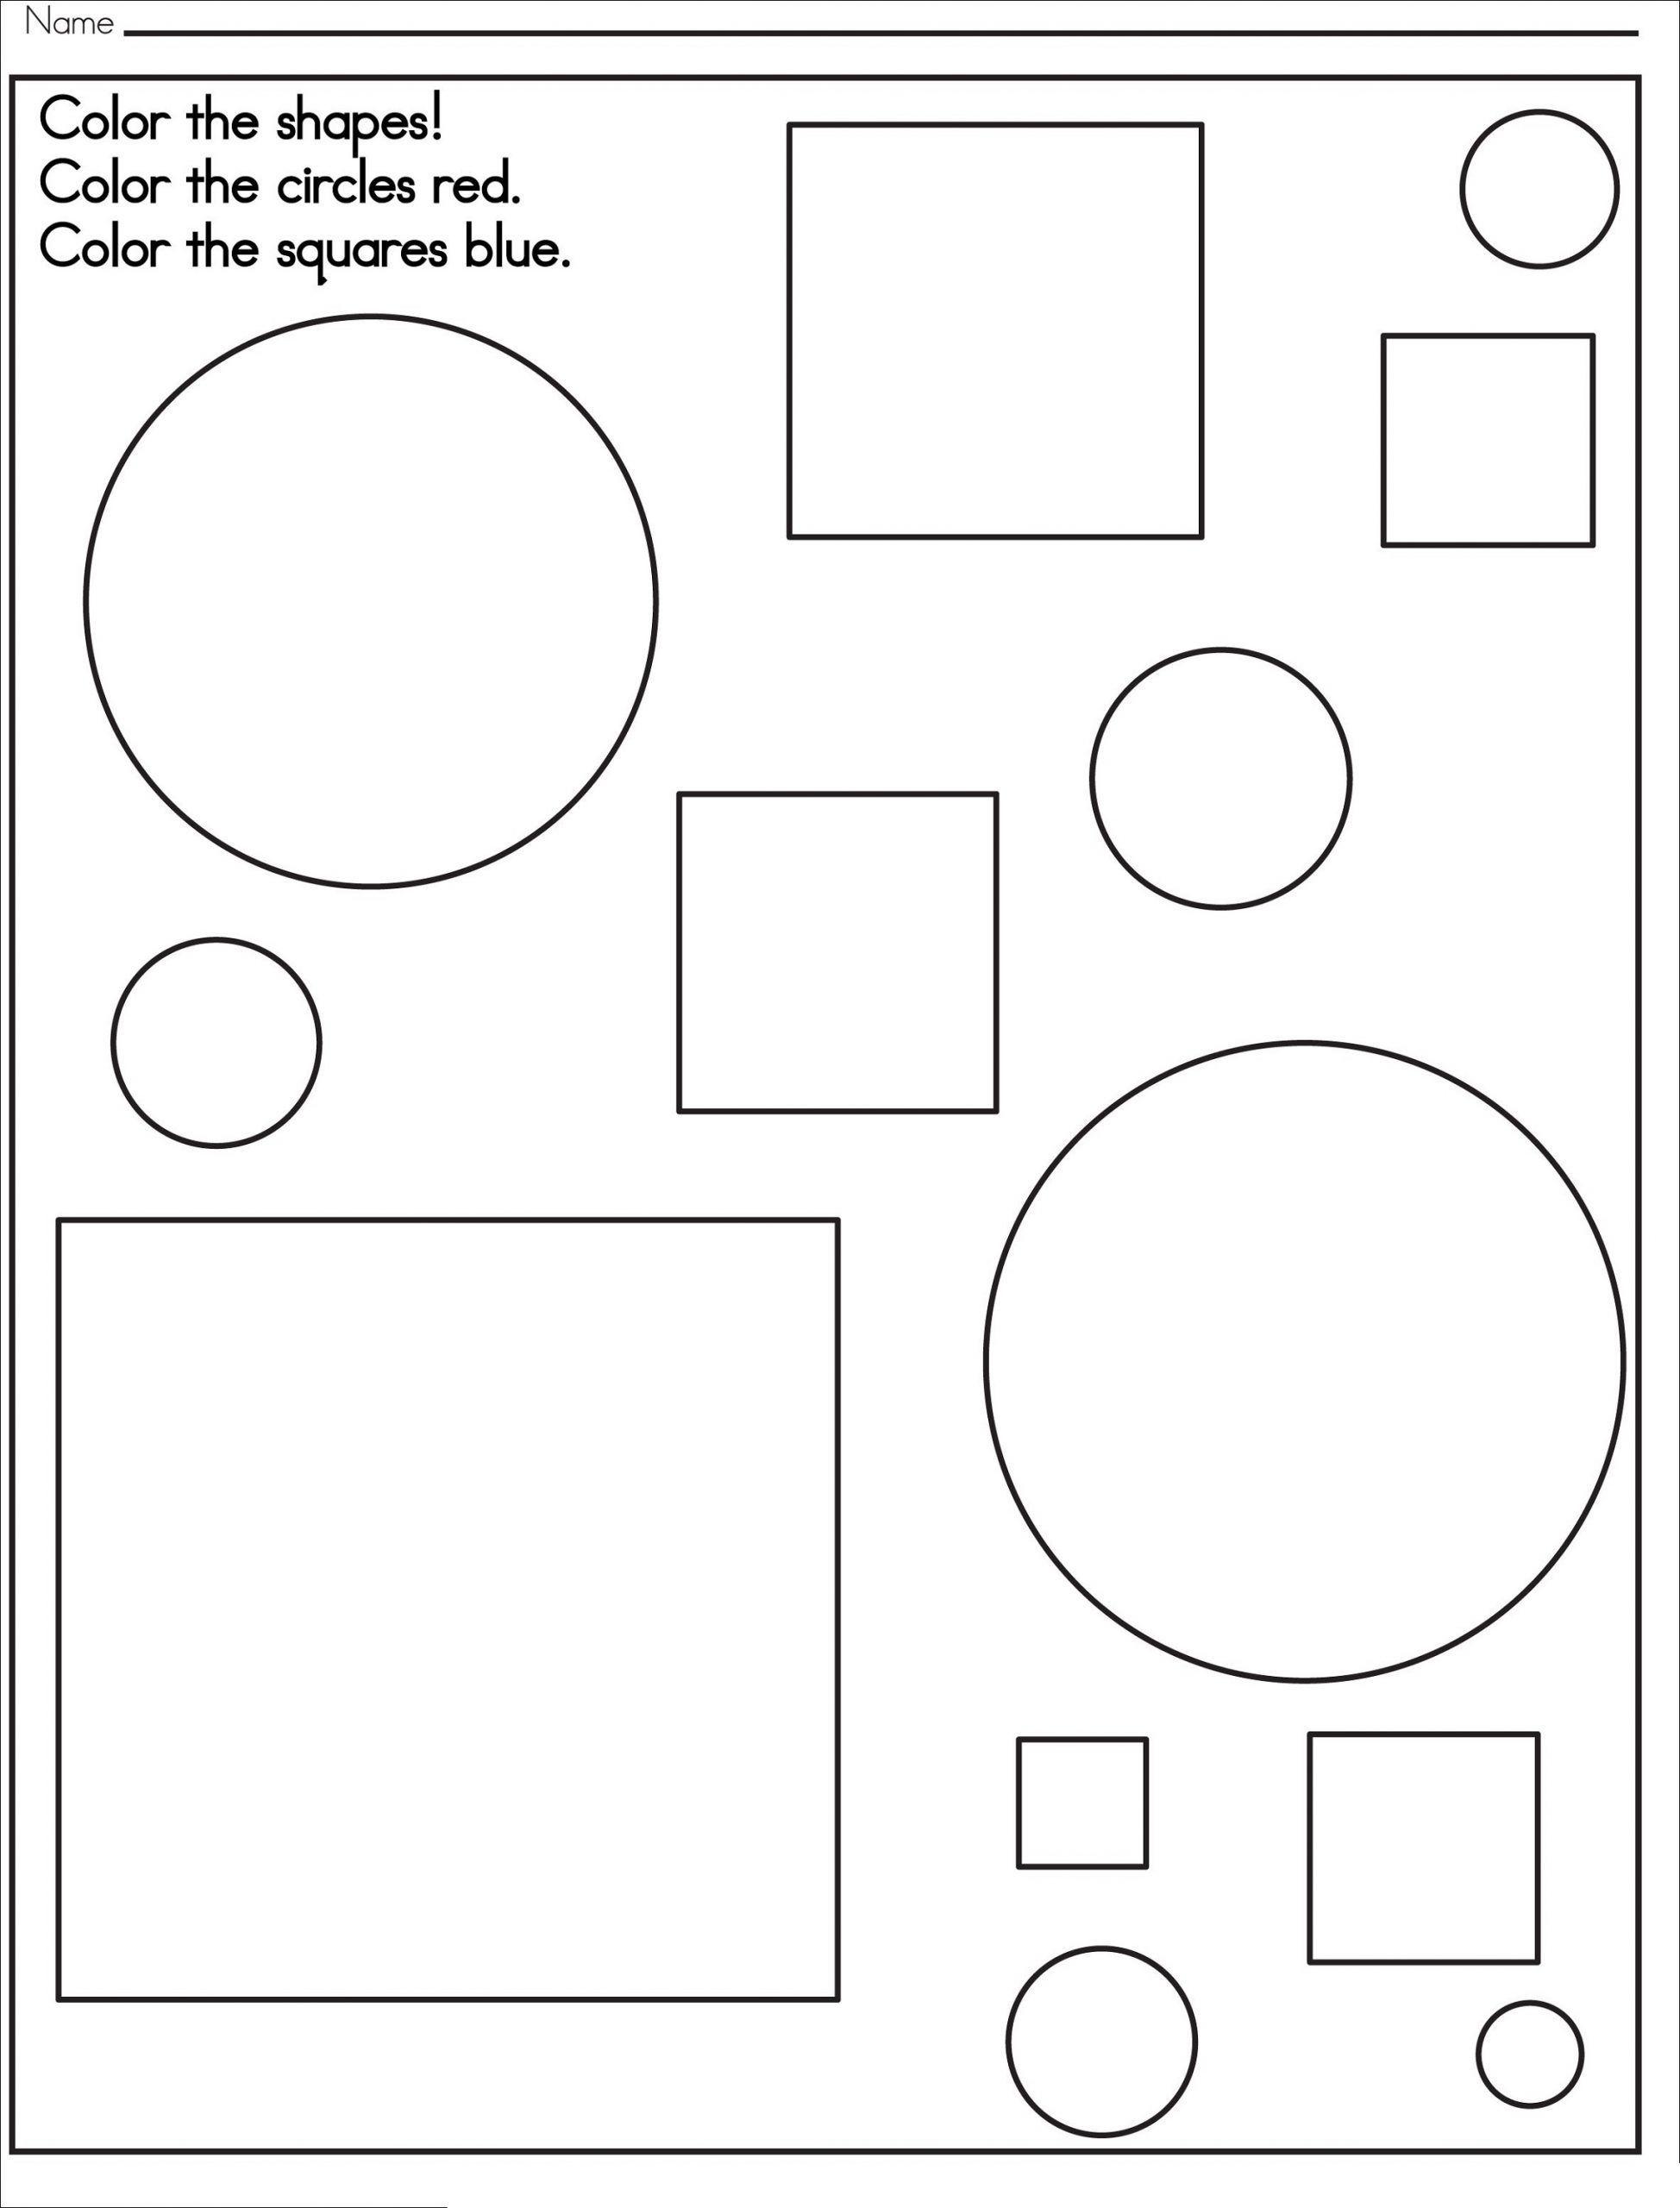 Color The Shapes Worksheet In